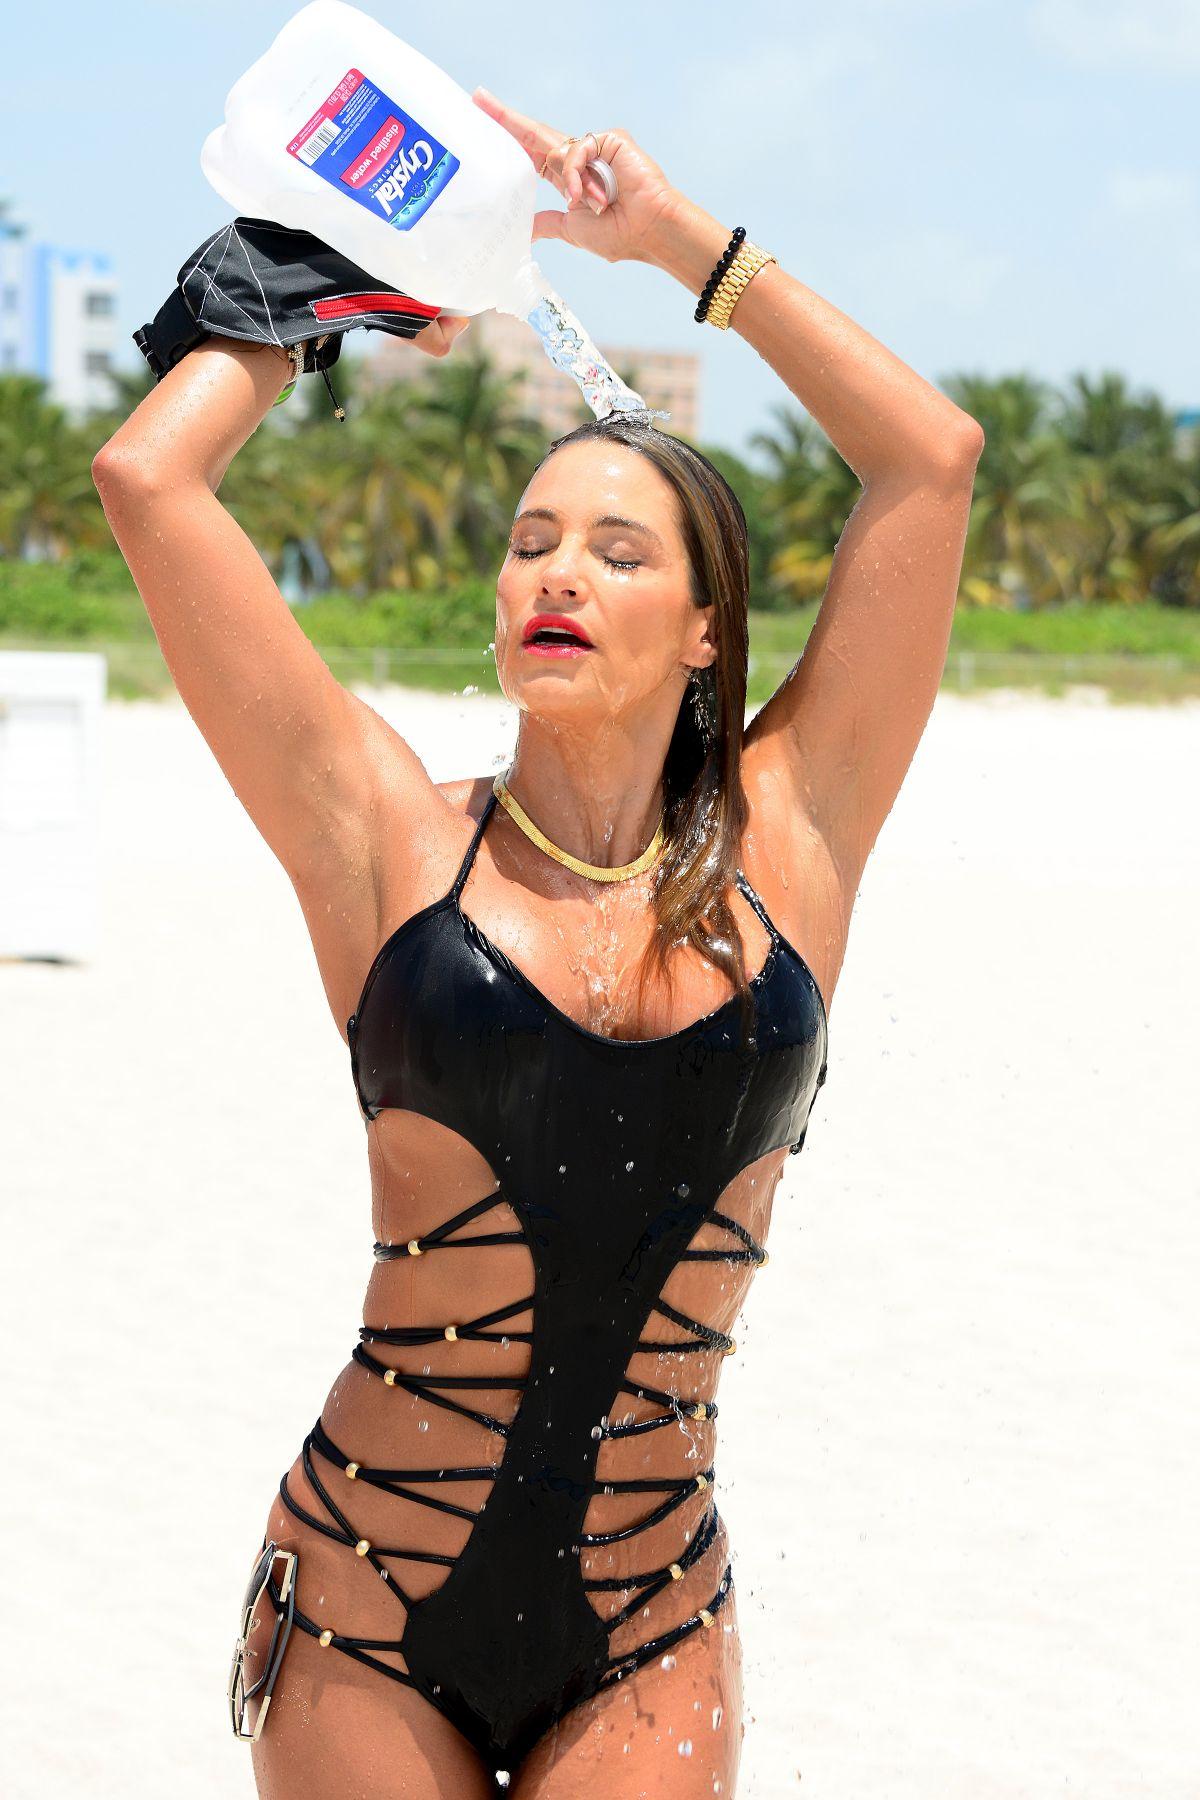 JENNIFER NICOLE LEE at a Beach in Miami 11/05/2015